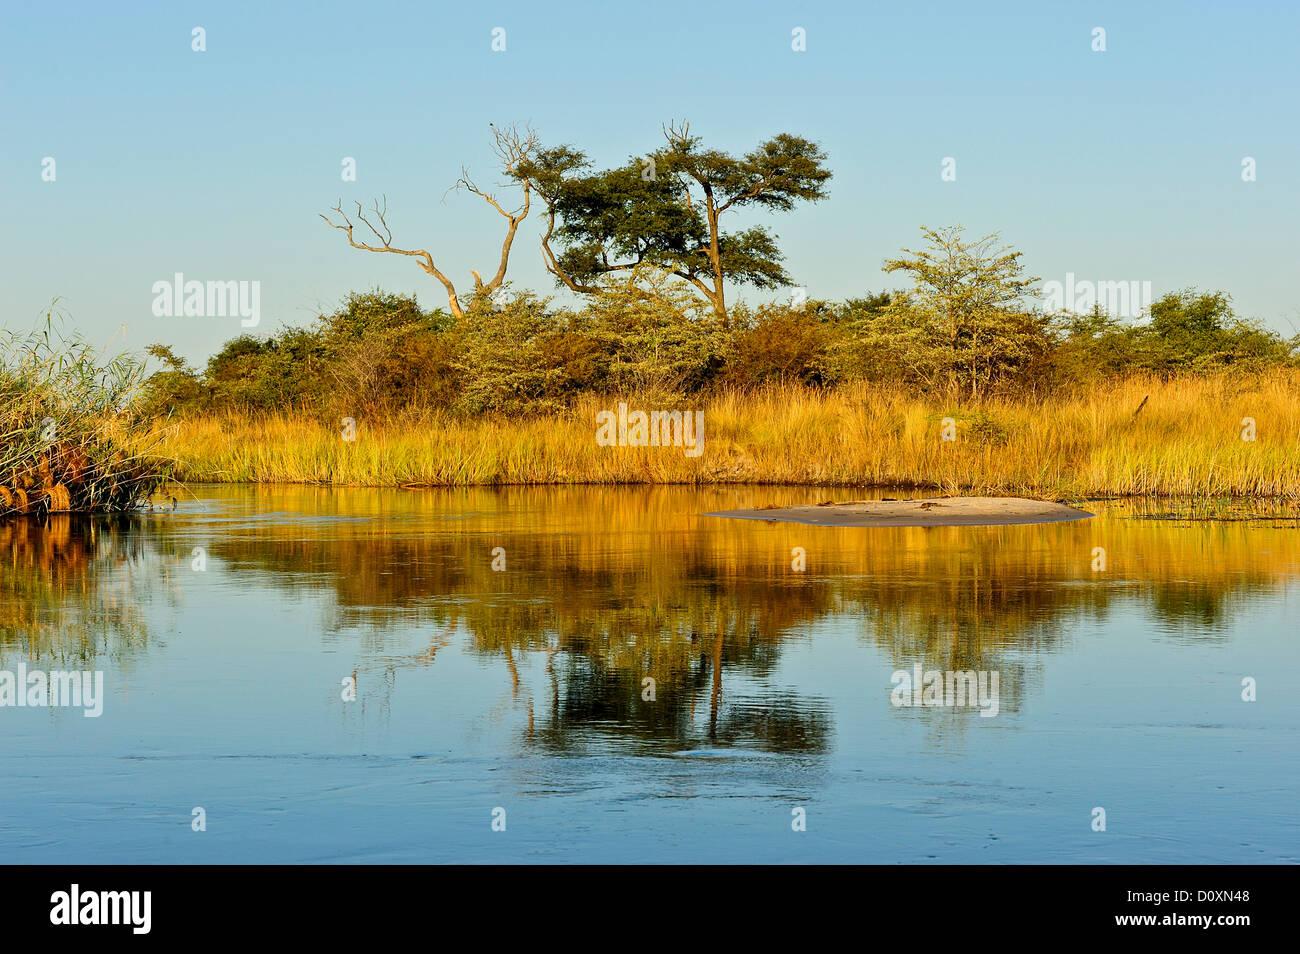 Africa, Bwa Bwata, National Park, Caprivi, Namibia, grasslands, horizontal, savannah, sunny, tree, water, watering - Stock Image